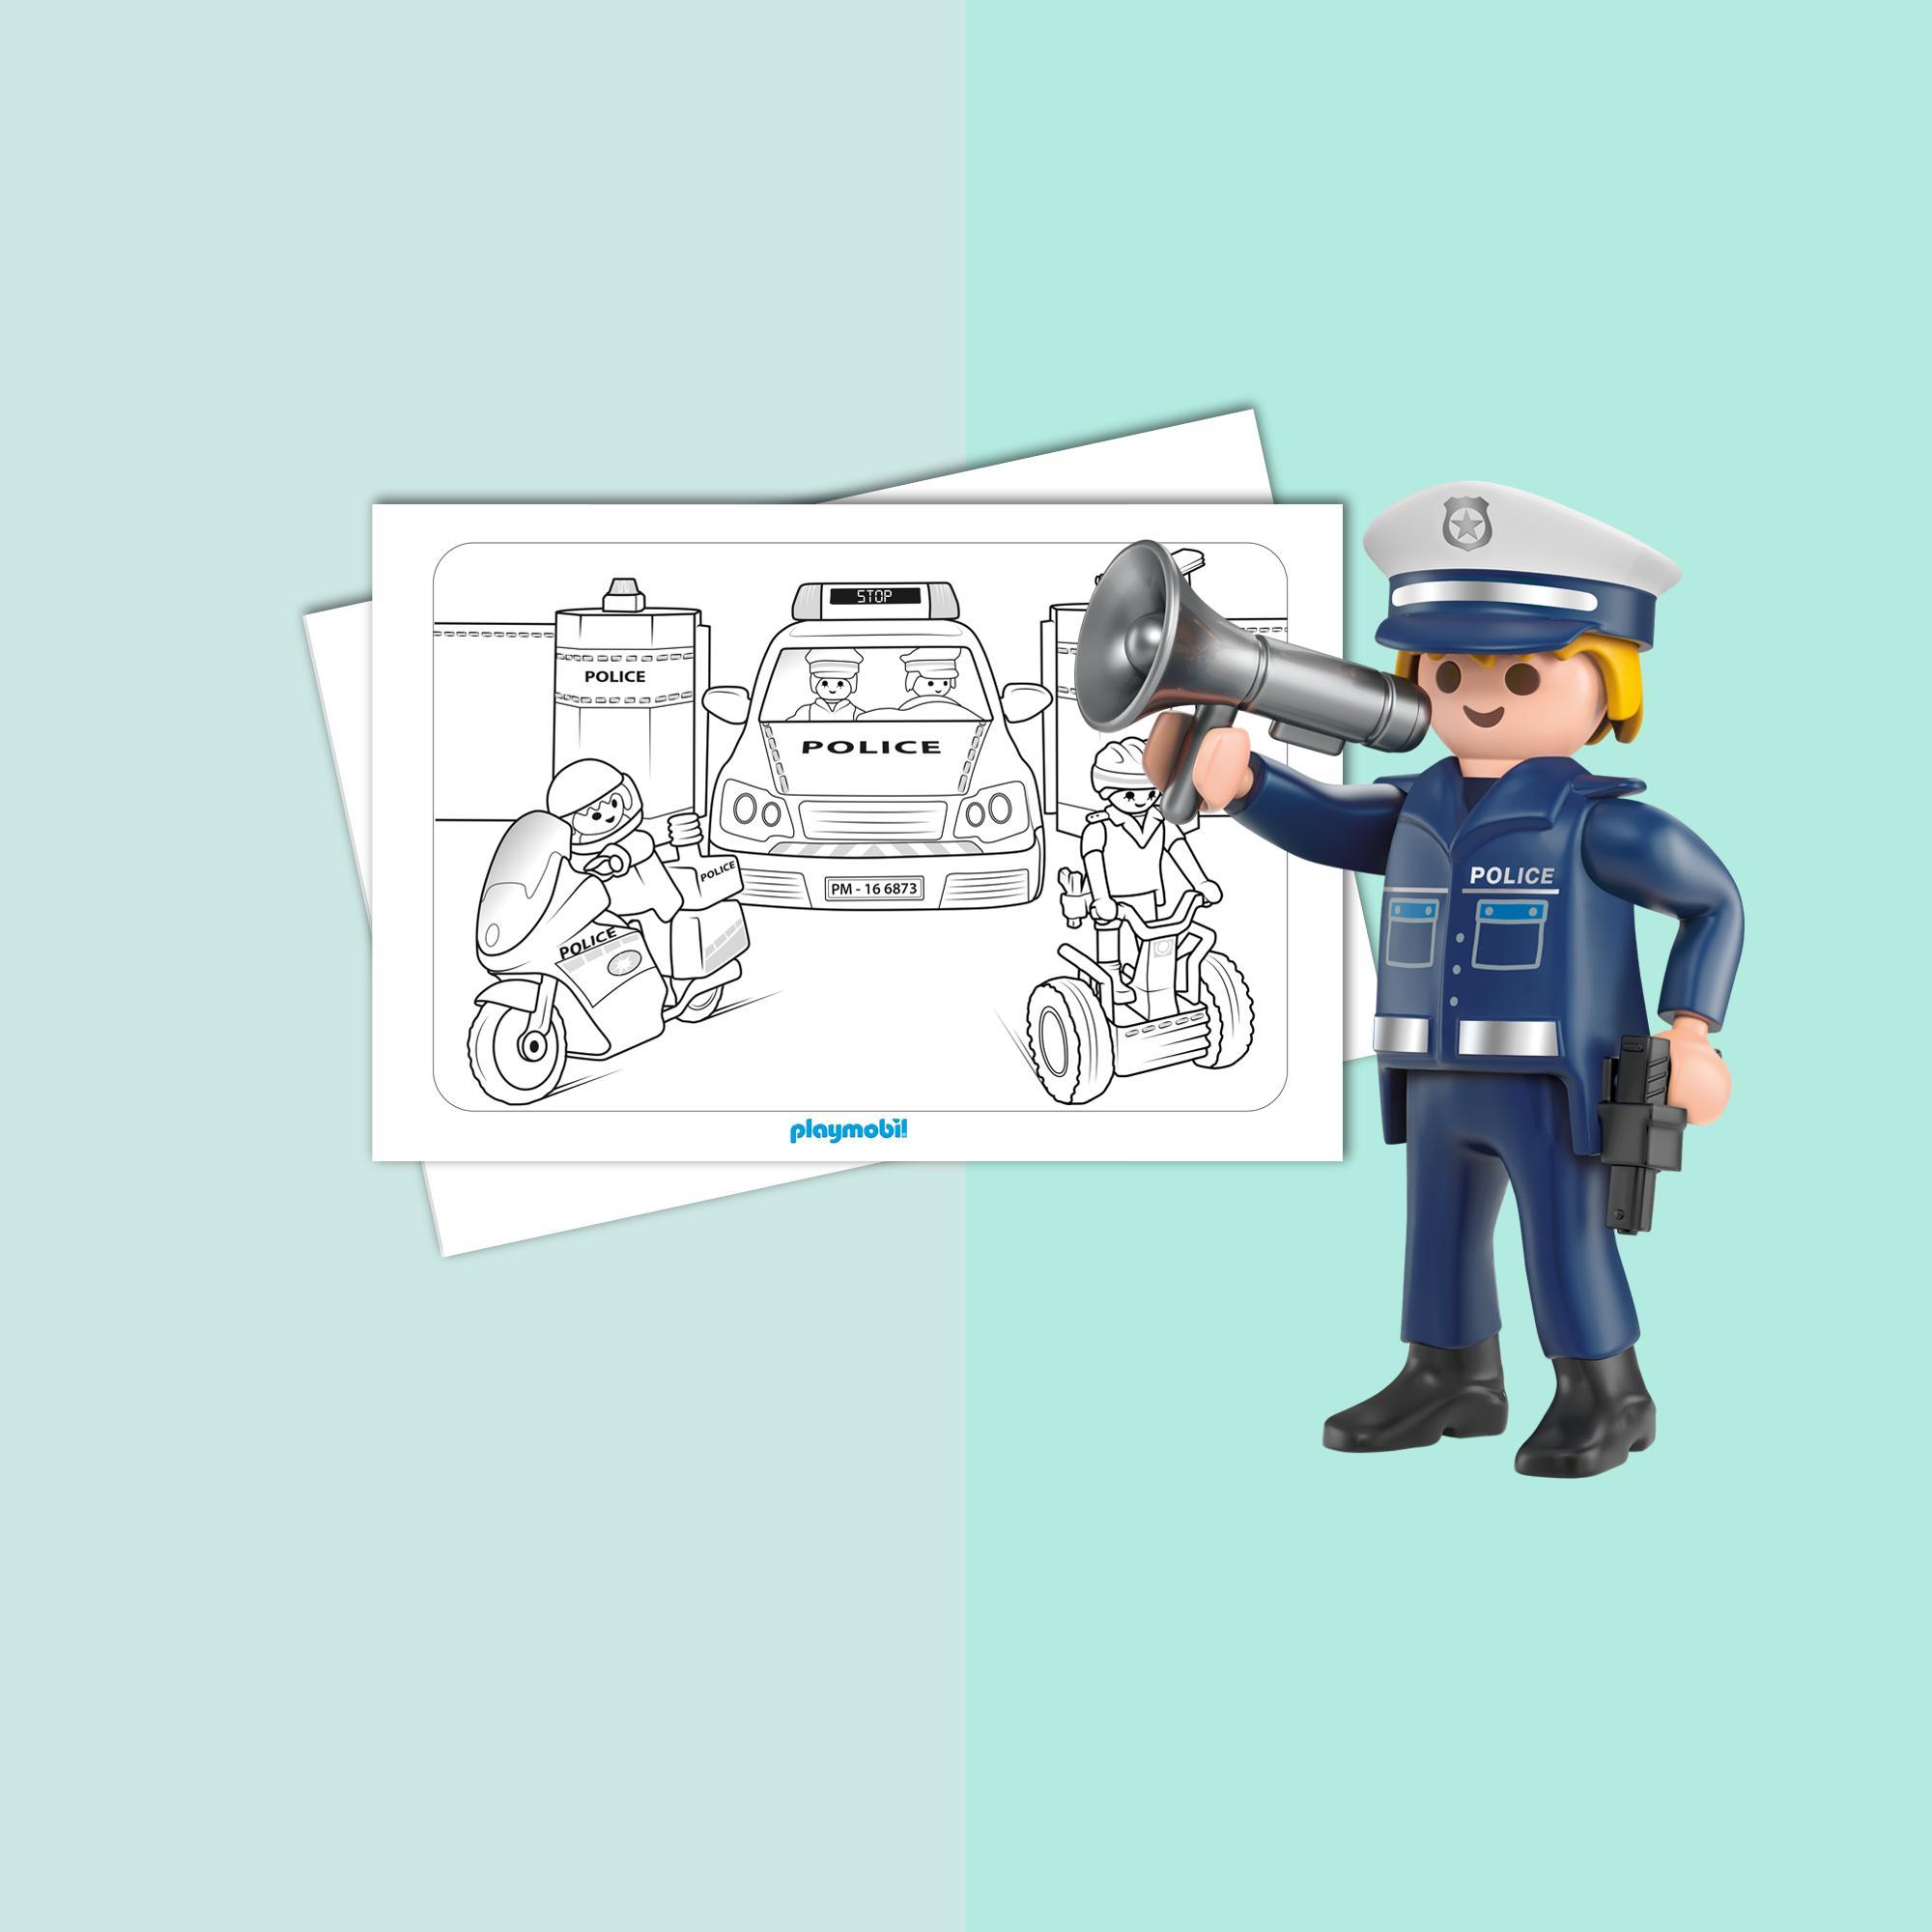 1422 playmobil malvorlage polizei Coloring and Malvorlagan